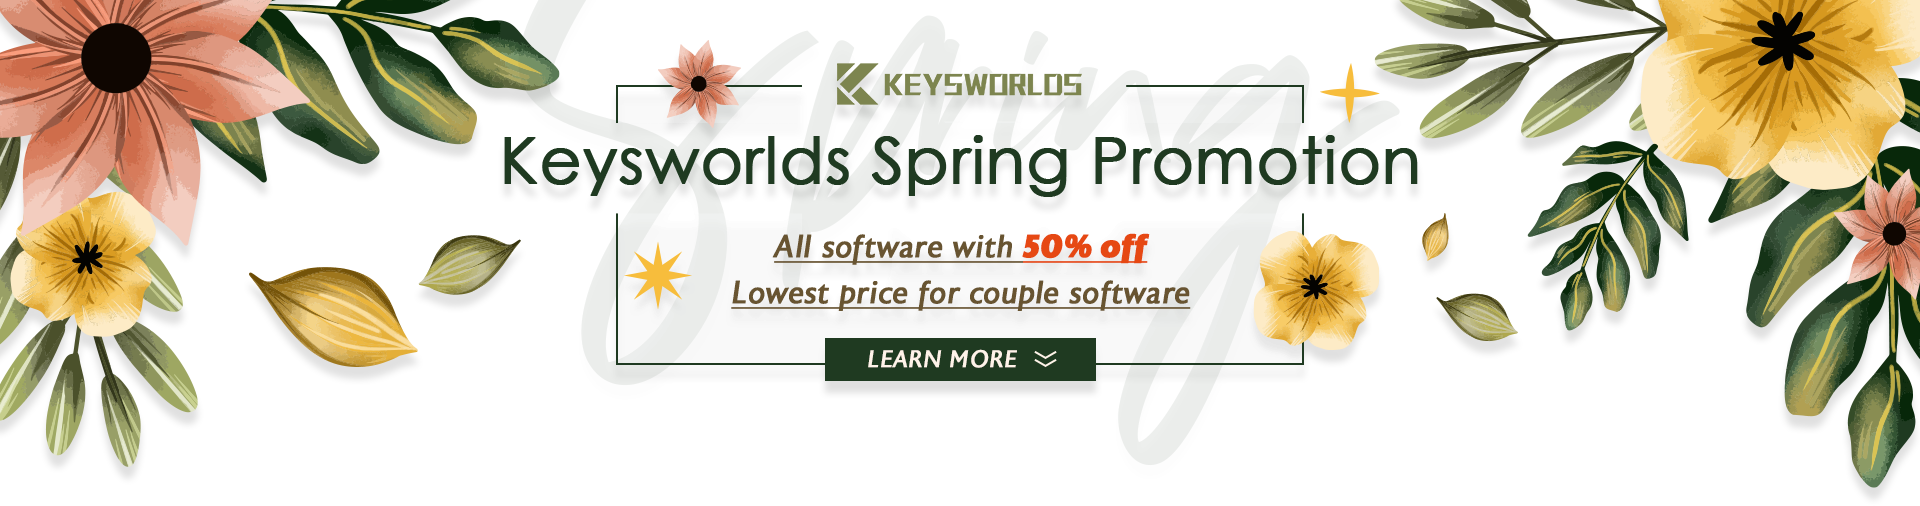 Windows 10 Spring Sale